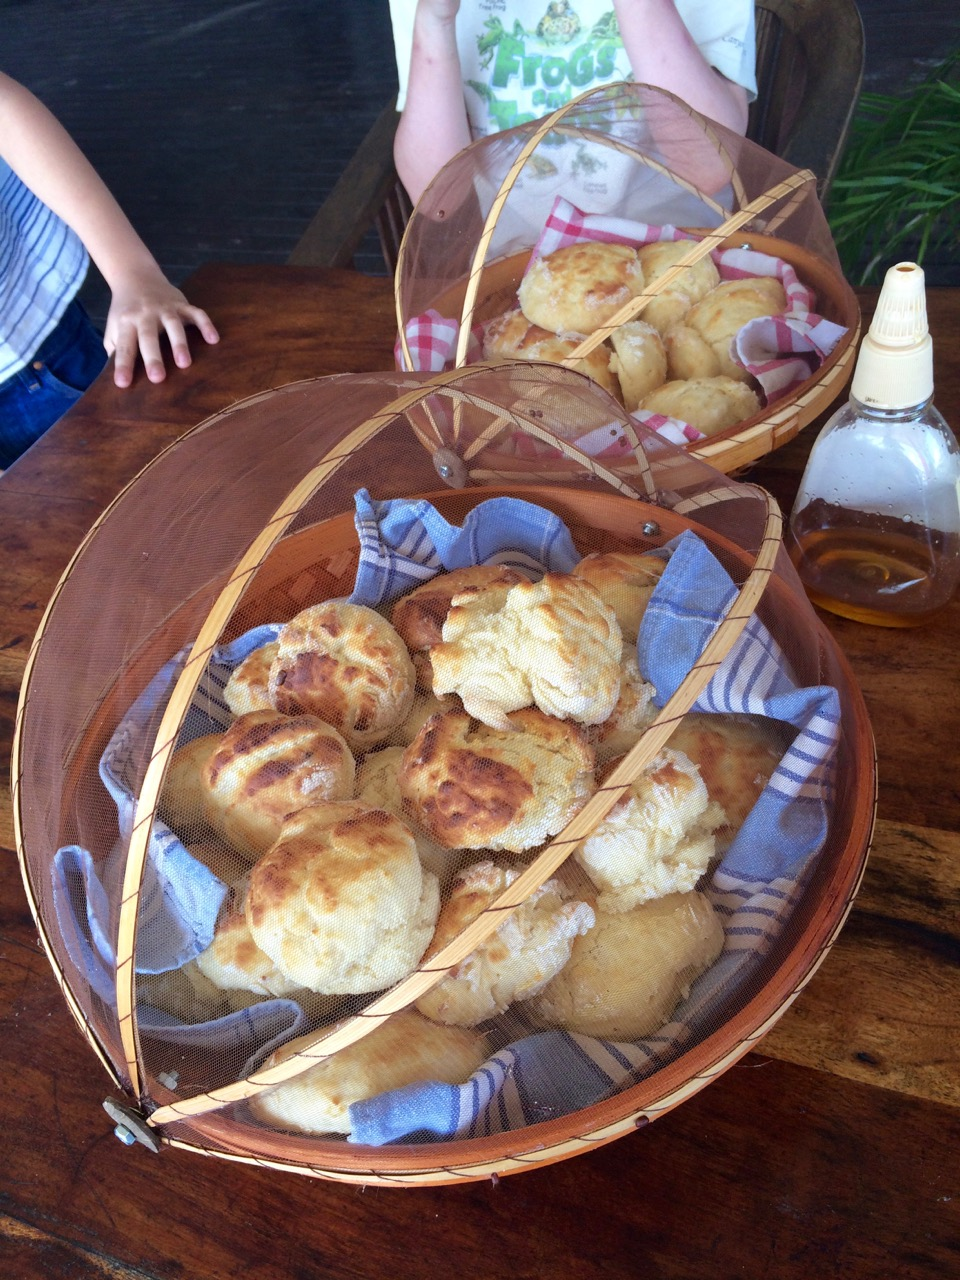 Aussie's love their scones and tea!